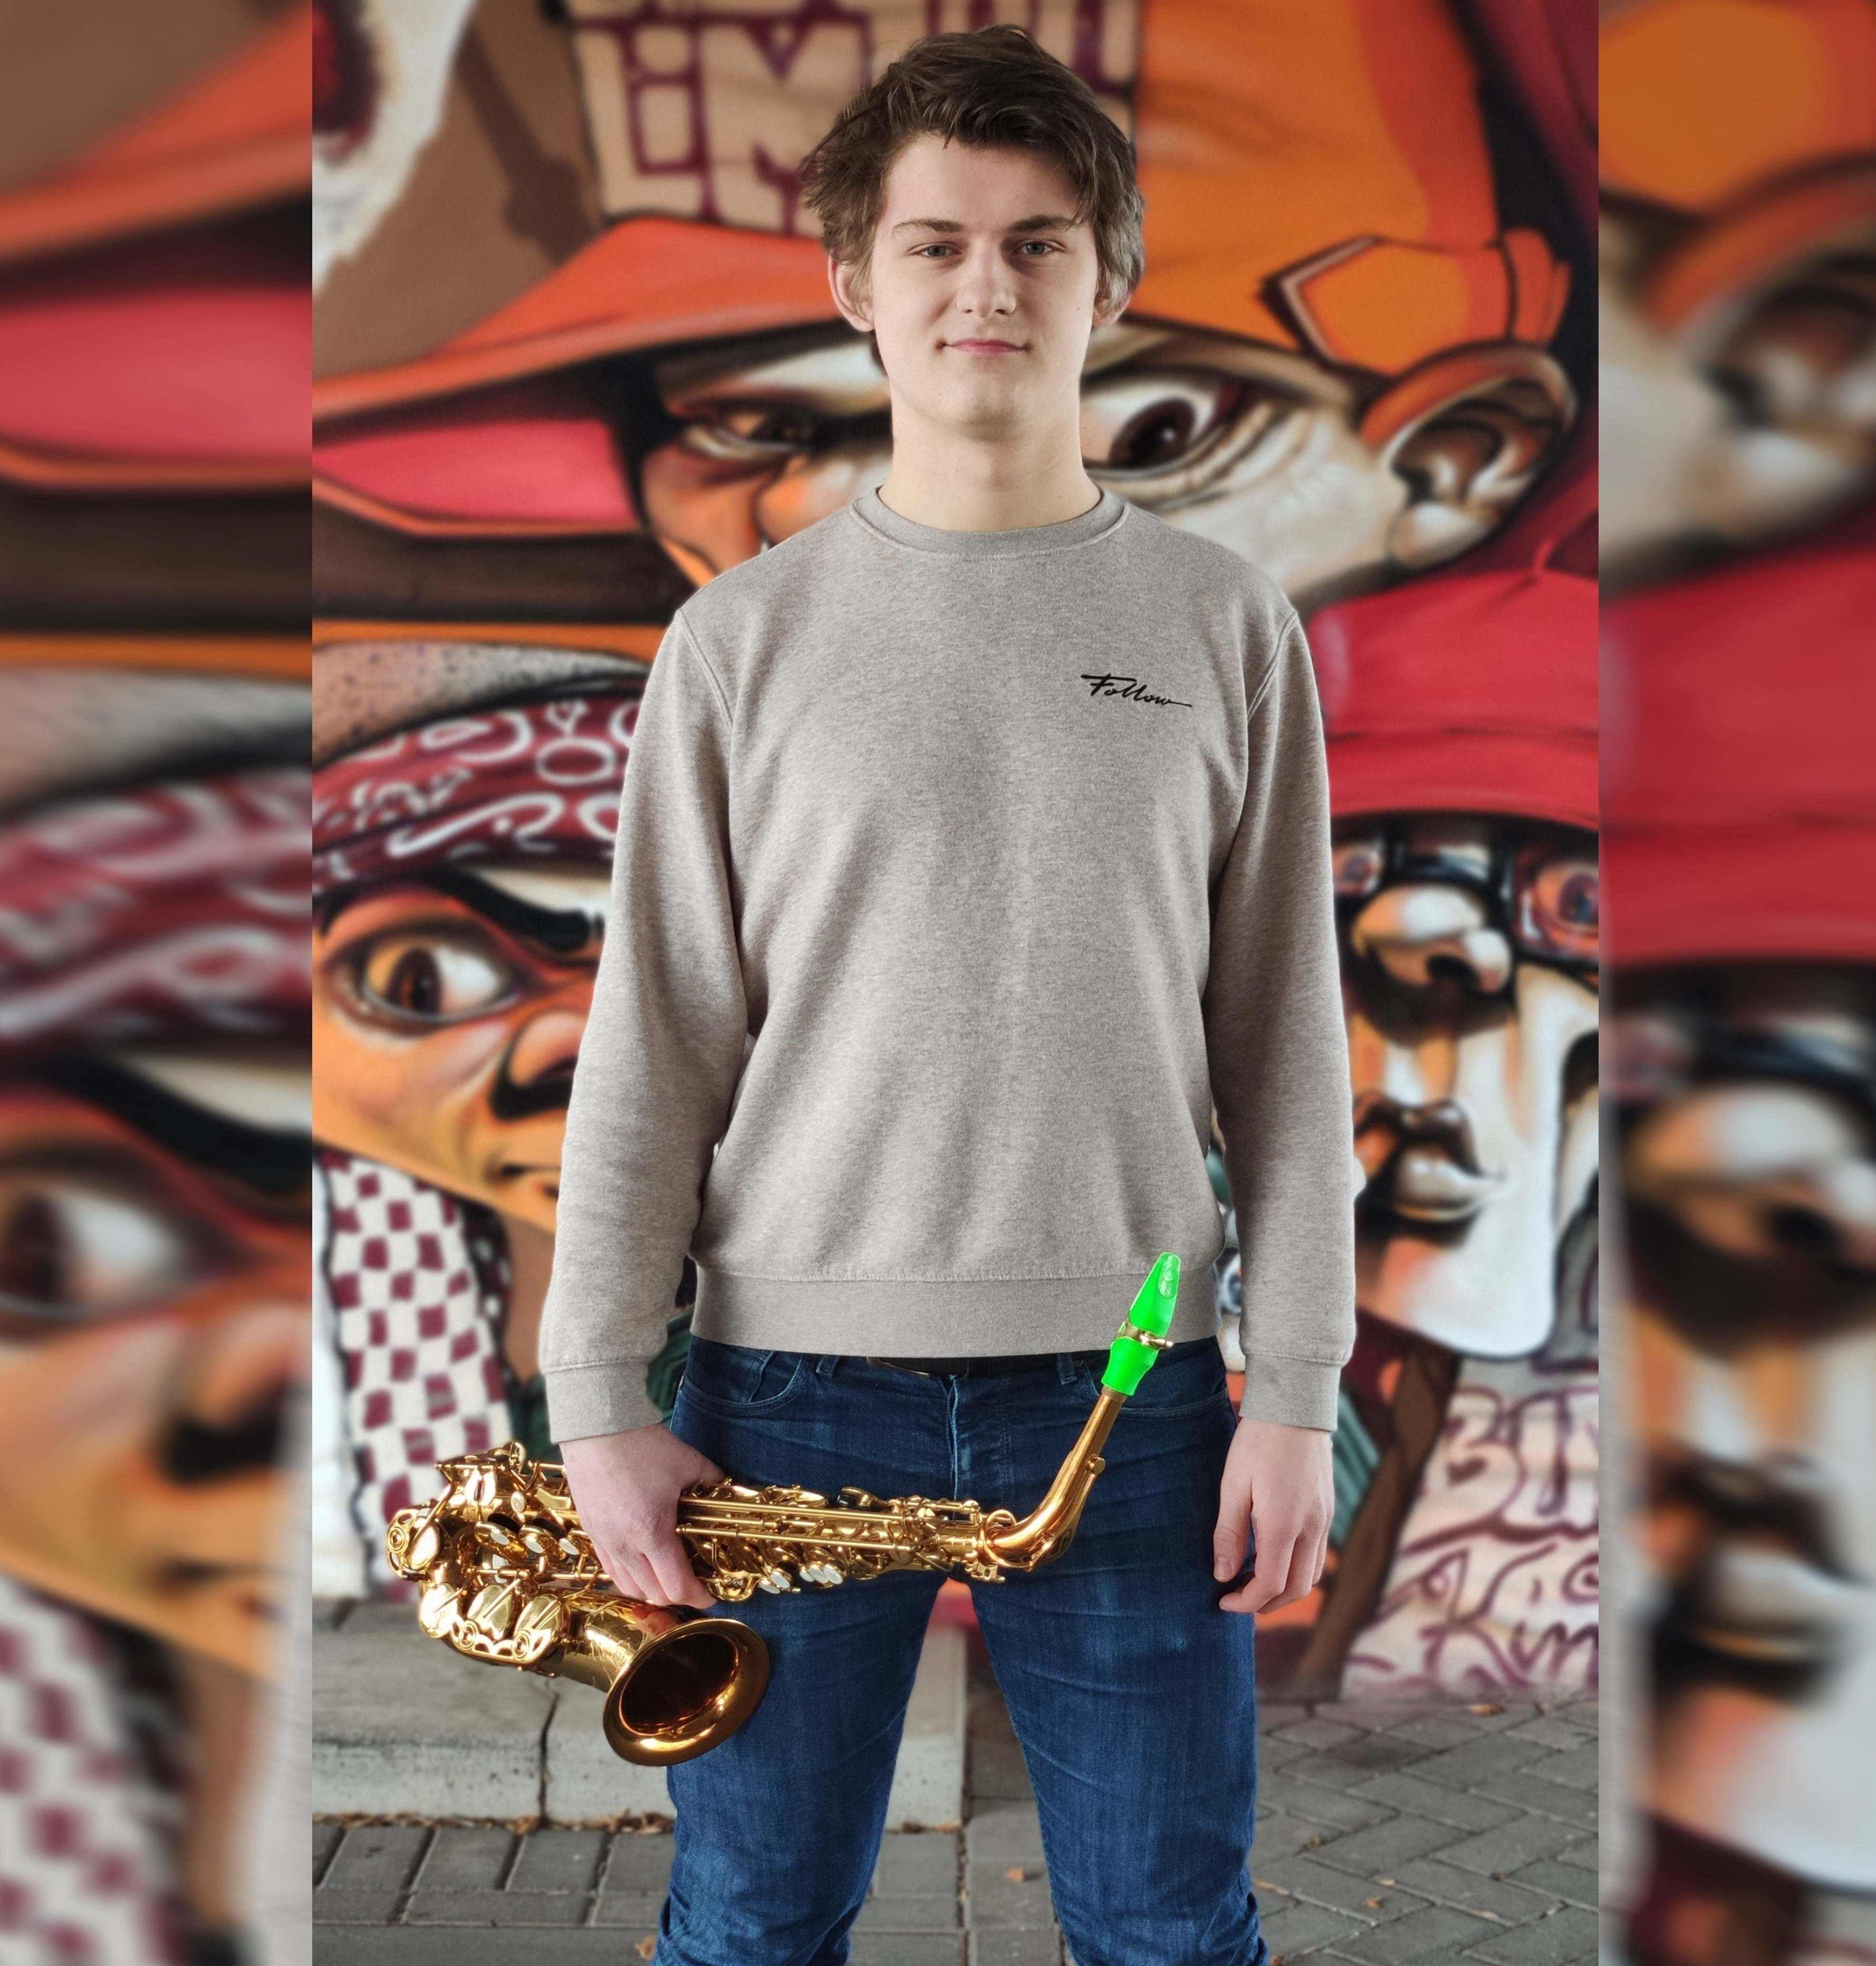 Karsten Belt plays a Syos saxophone mouthpiece